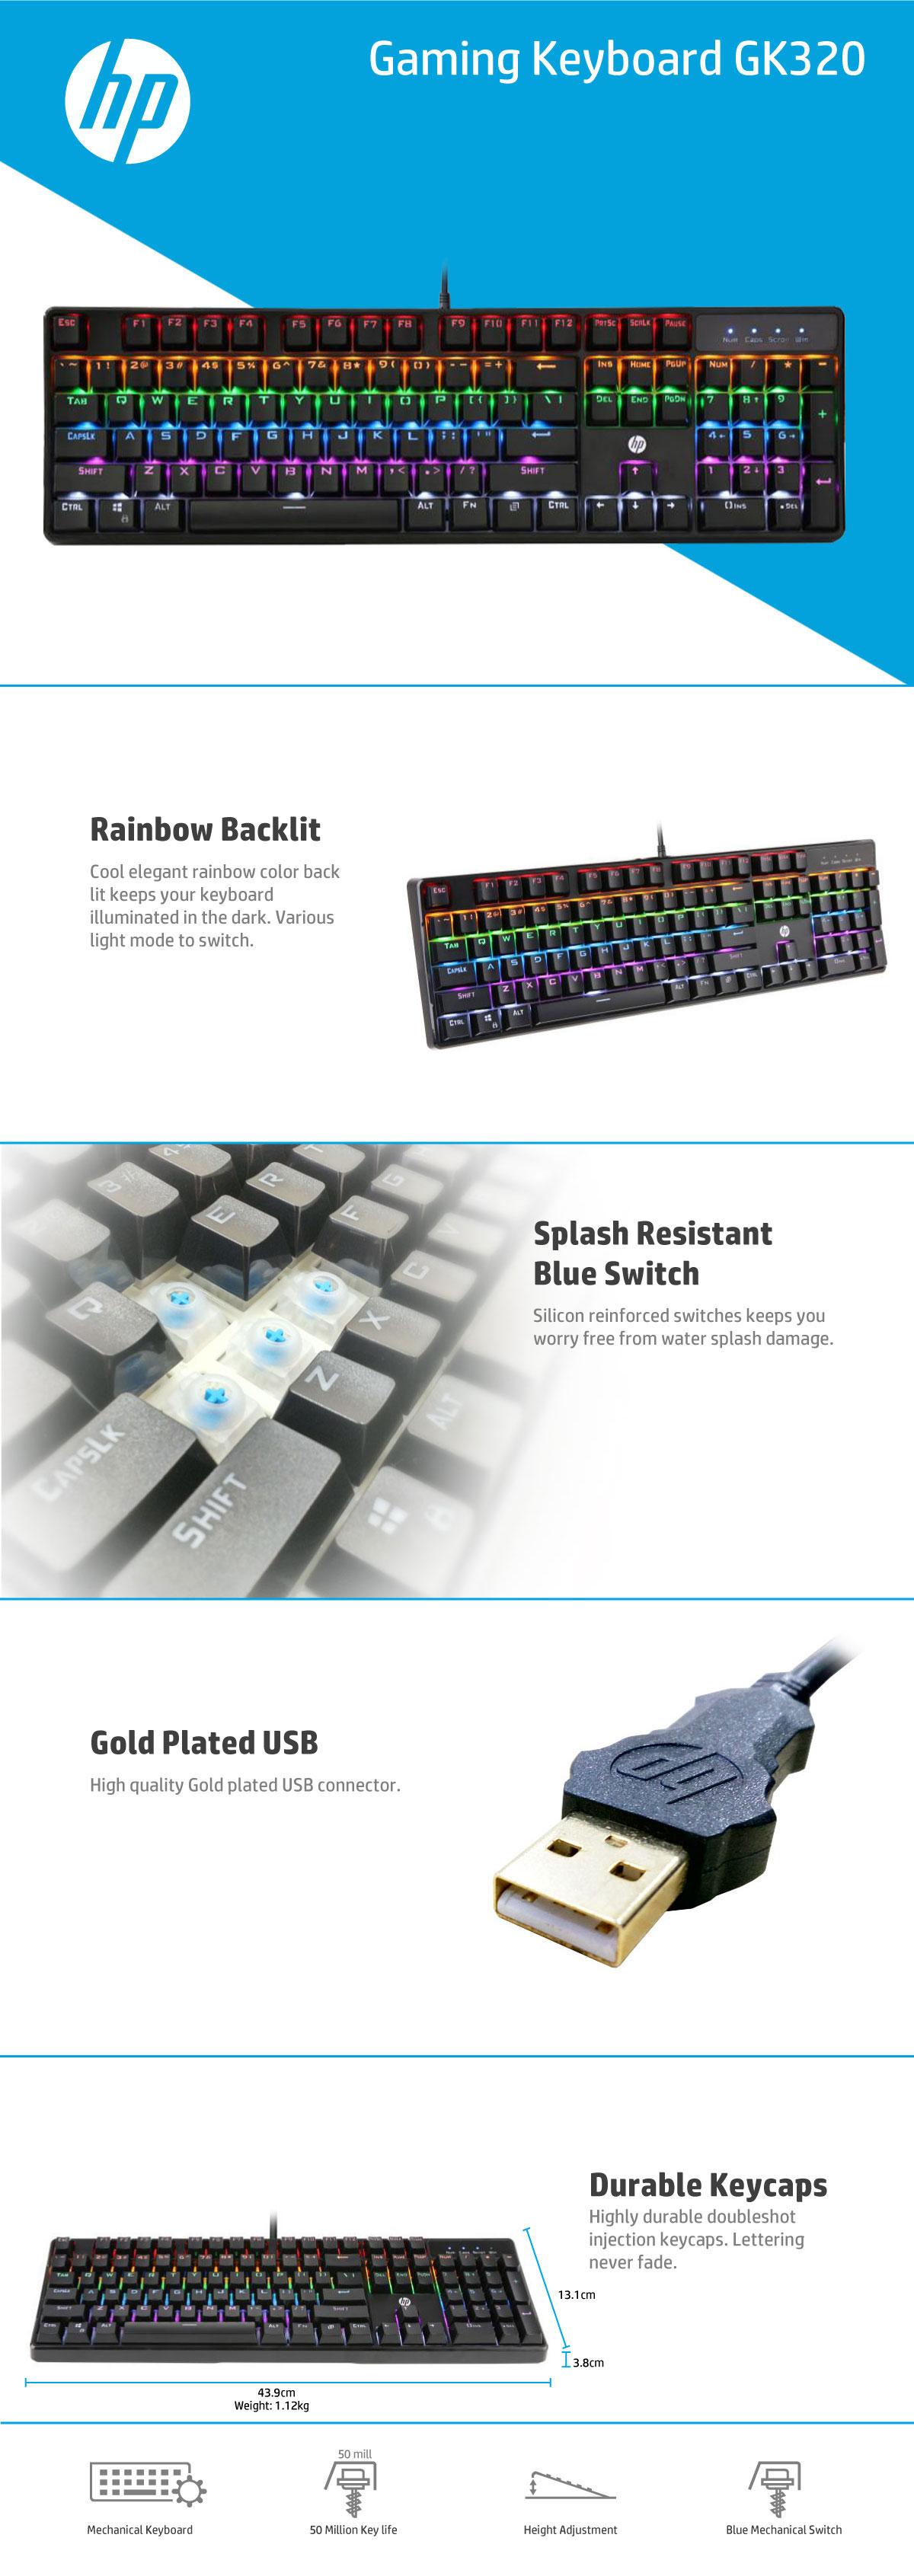 HP GK320 mechanical gaming keyboard